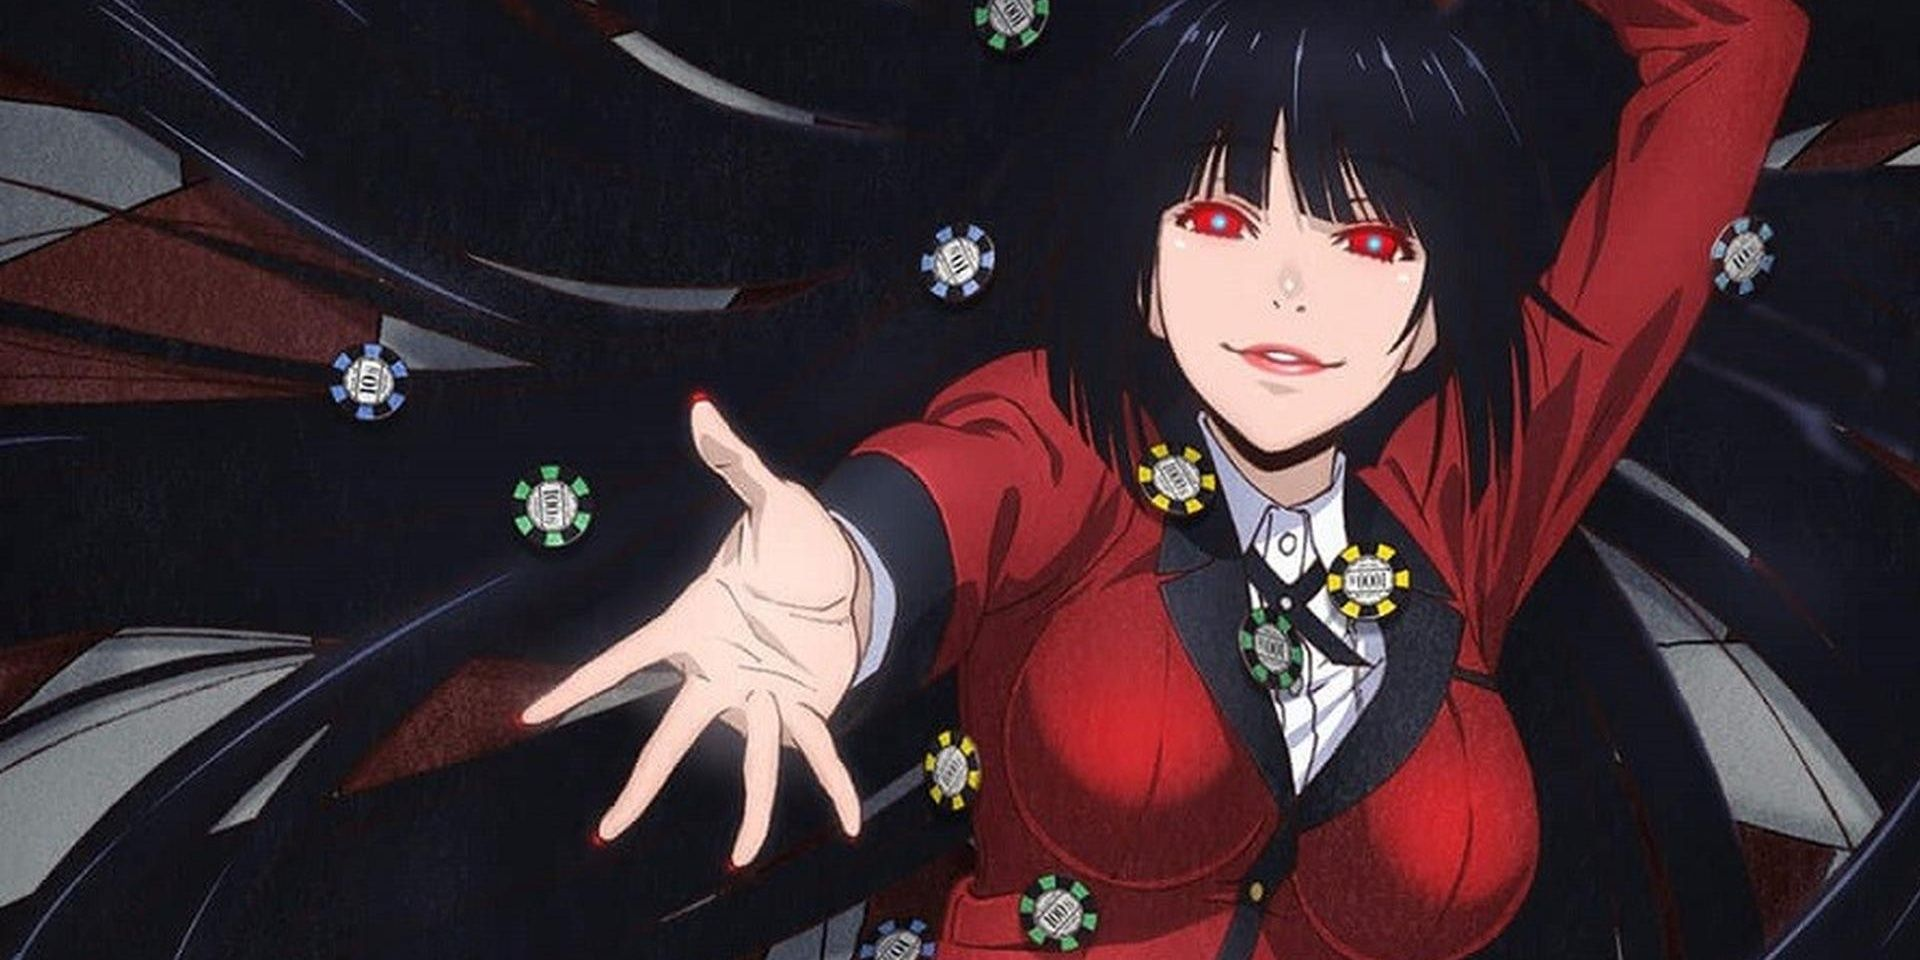 Sentai's Kakegurui Release Features a New English Dub | CBR